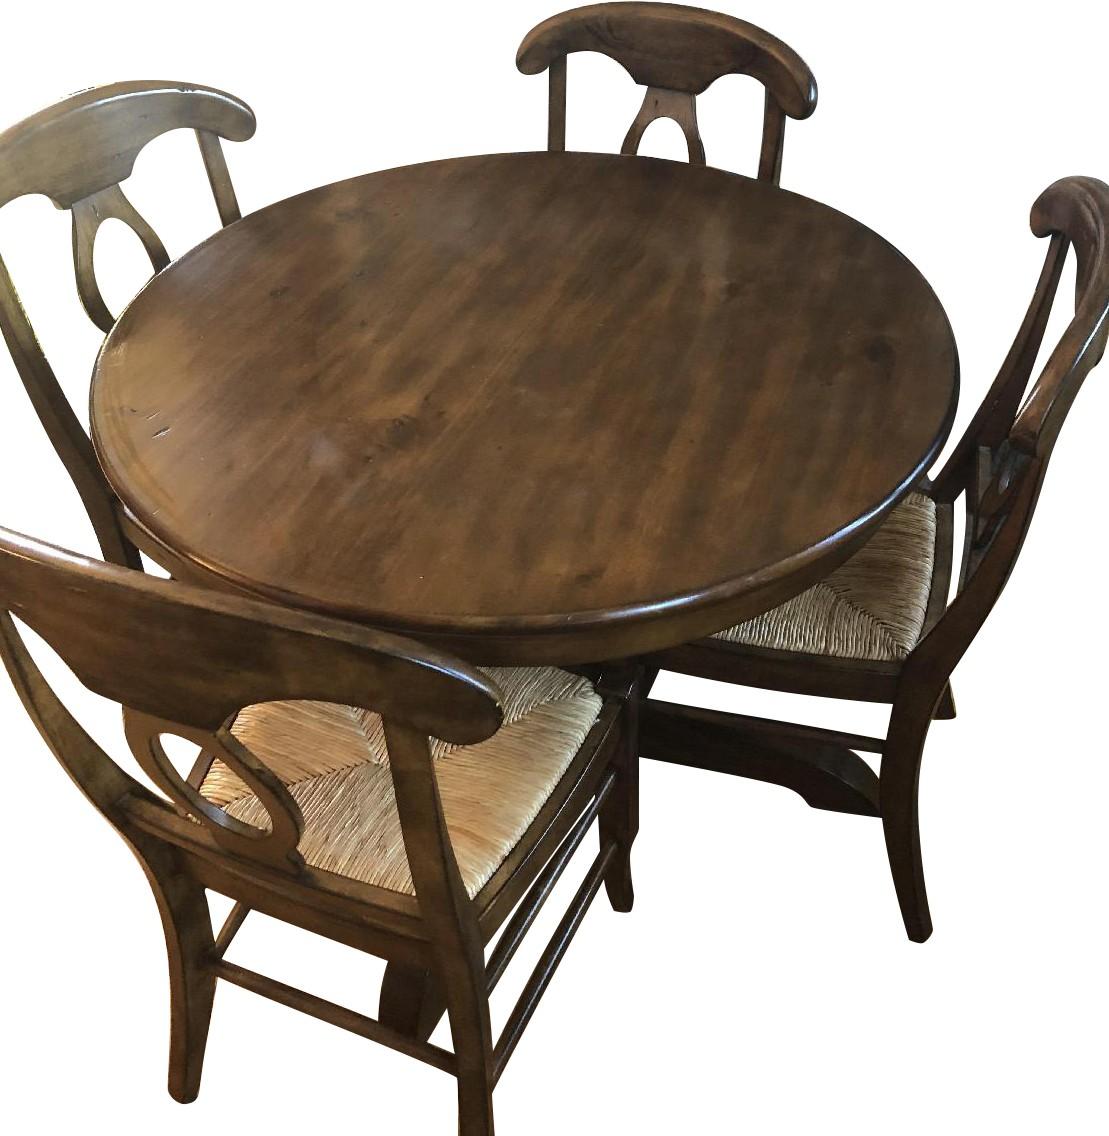 Pottery Barn Tivoli Round 5-Piece Dining Set